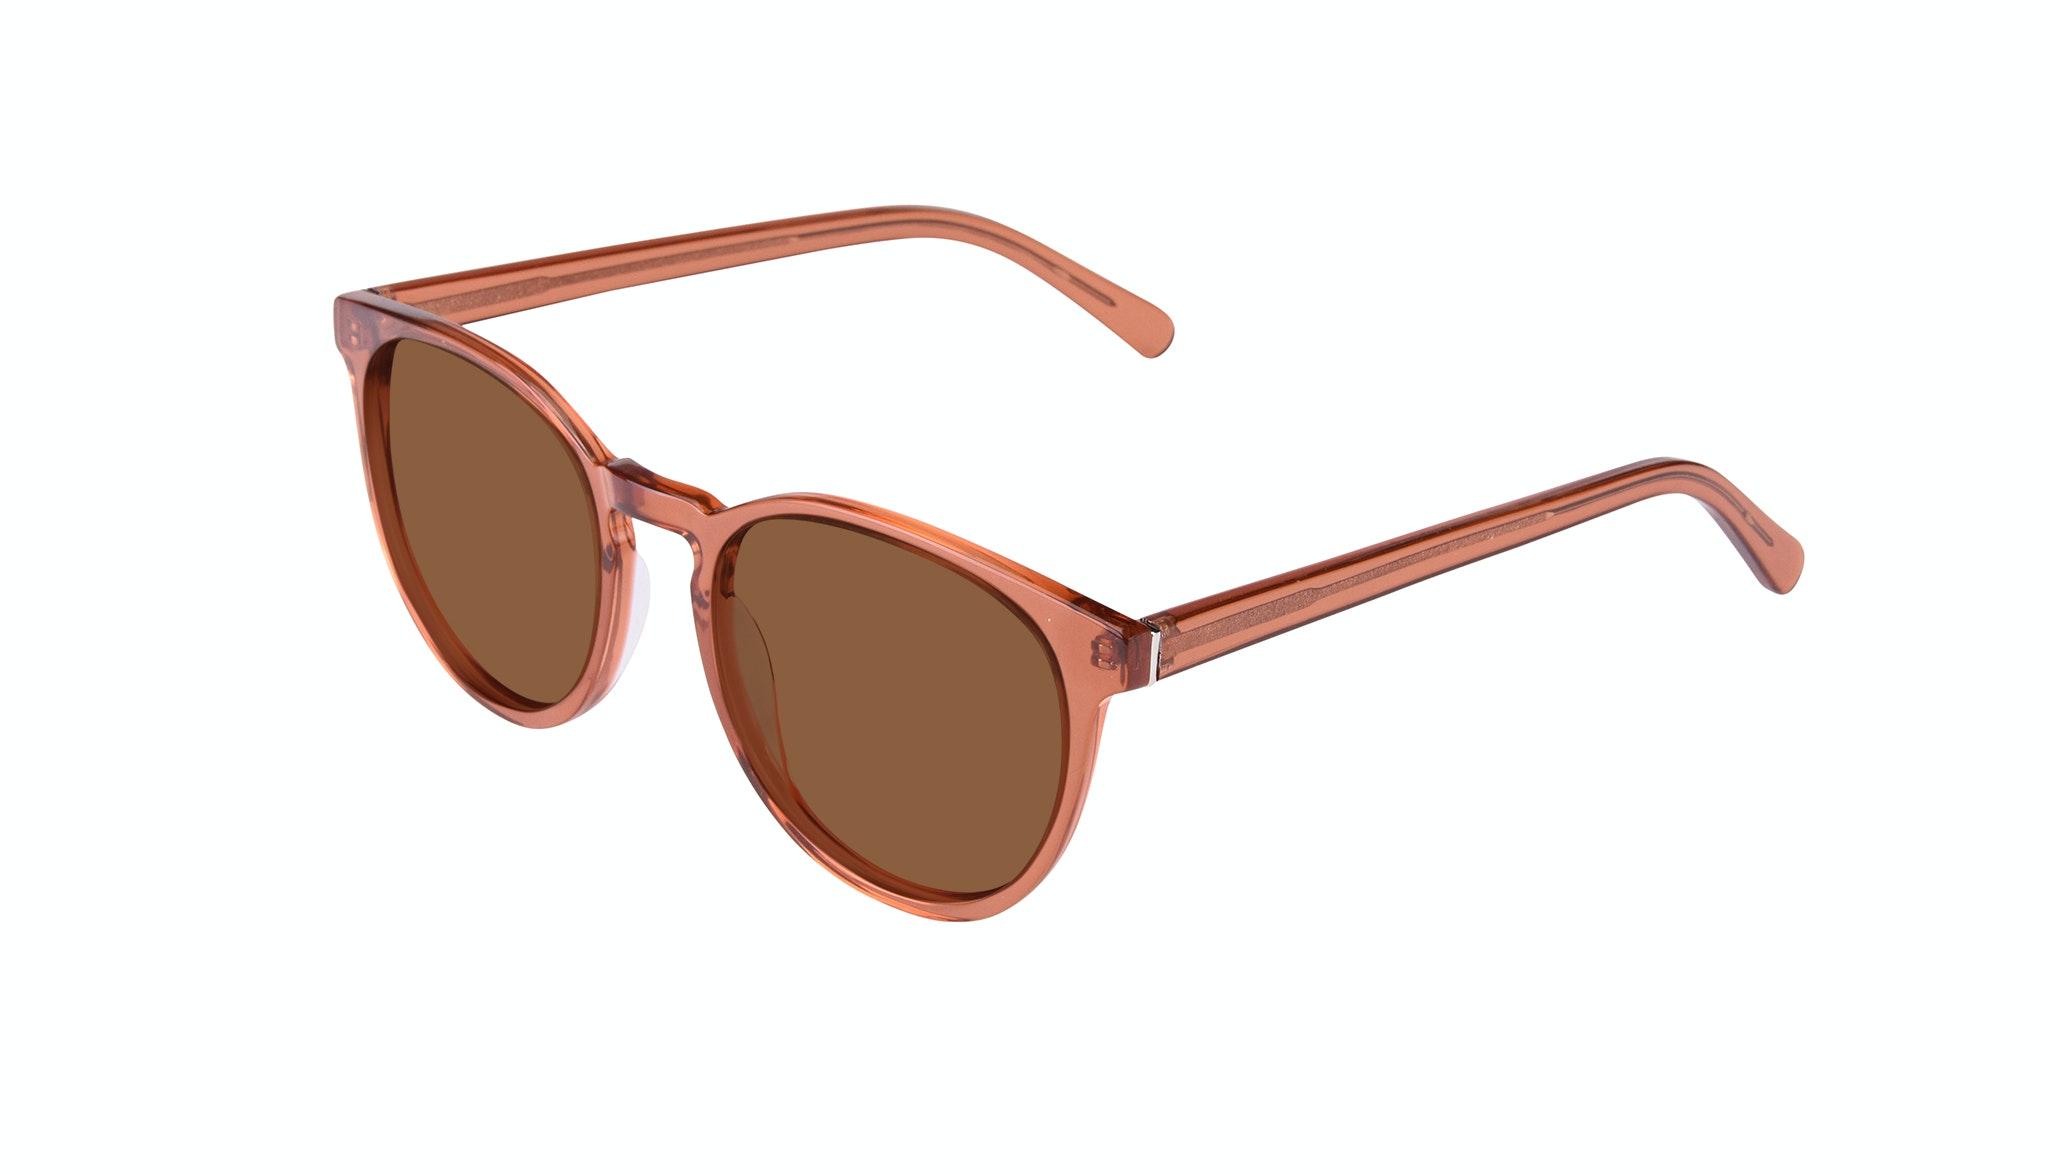 Affordable Fashion Glasses Round Sunglasses Women Brilliant Umber Tilt